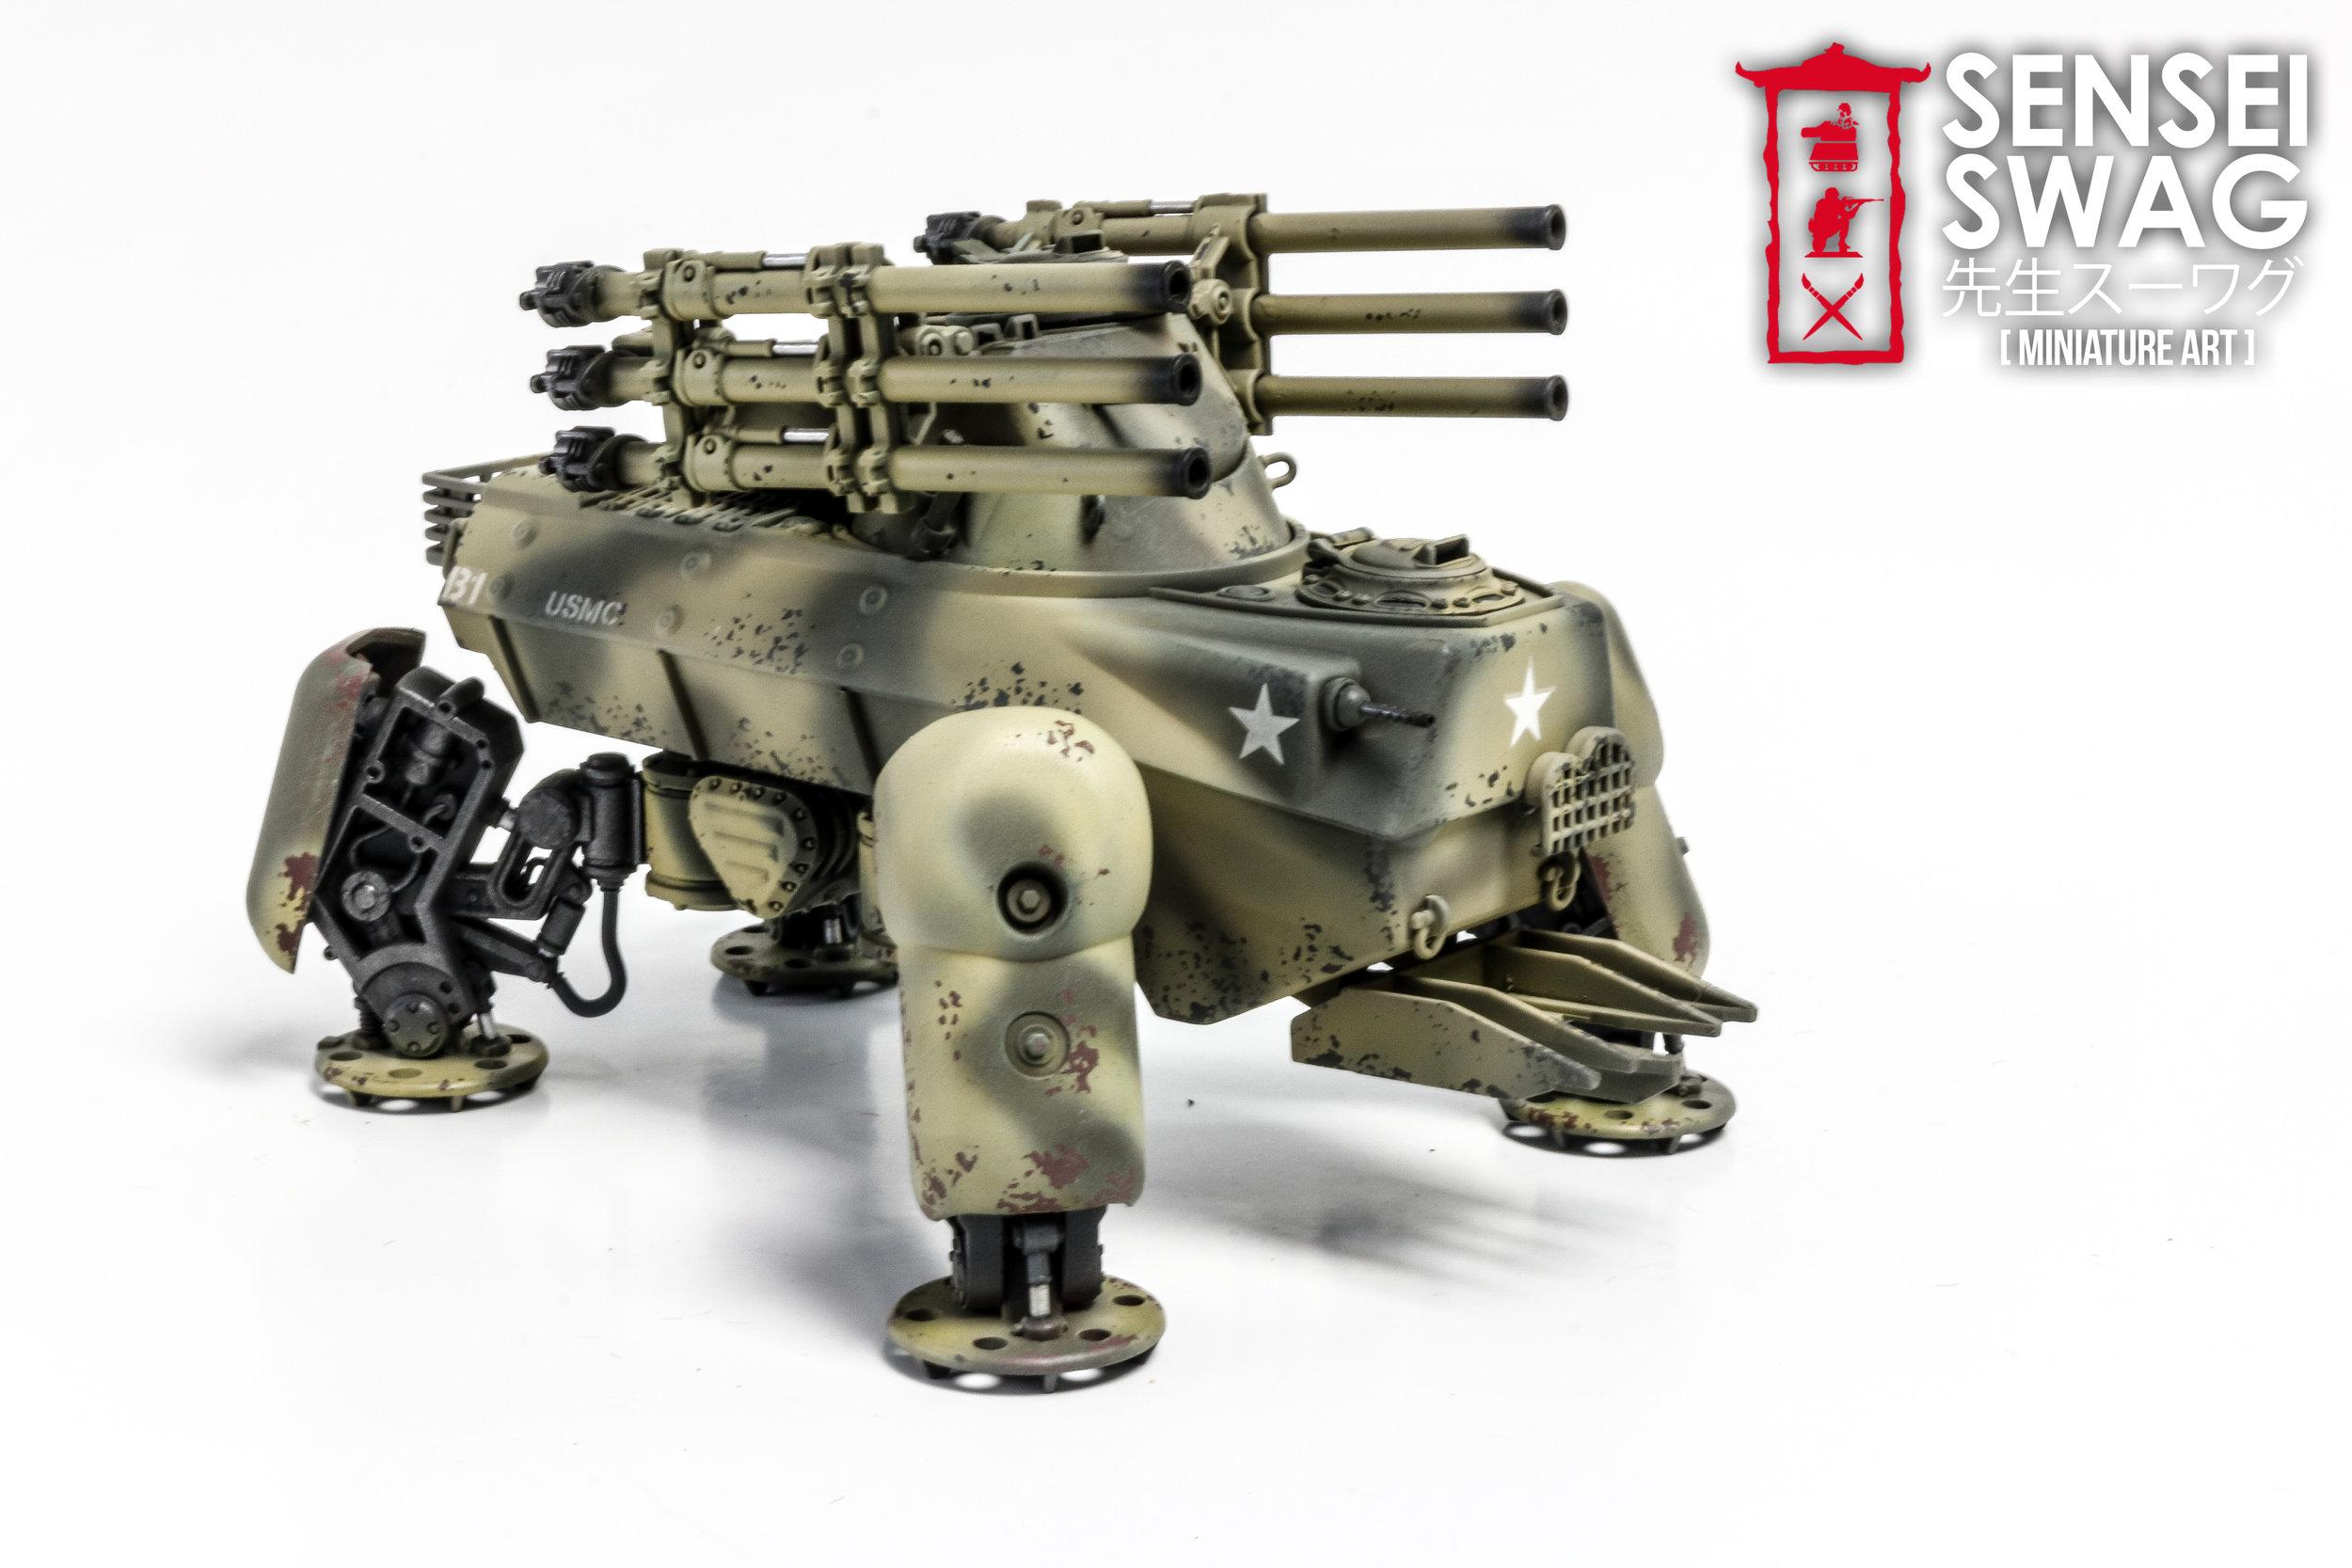 Dust Tactics Models Warfare Axis Allies Army-17.jpg